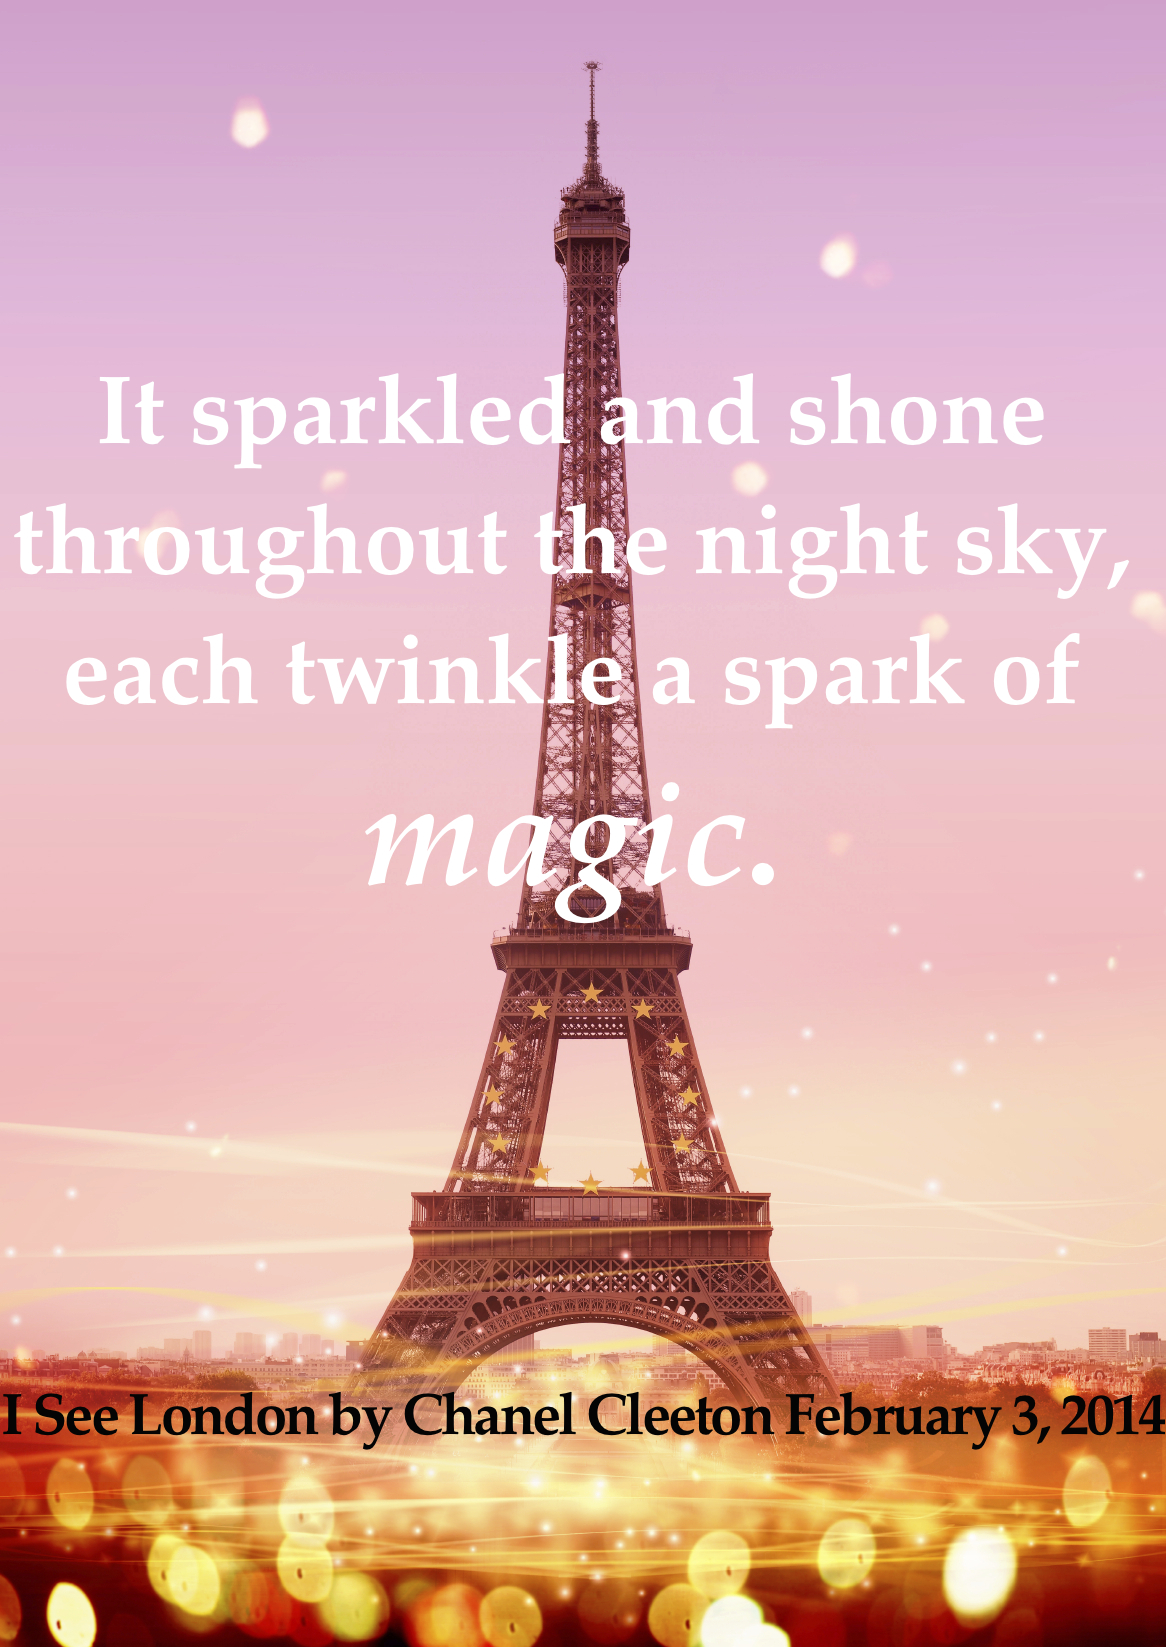 Eiffel Tower Teaser 3.jpg